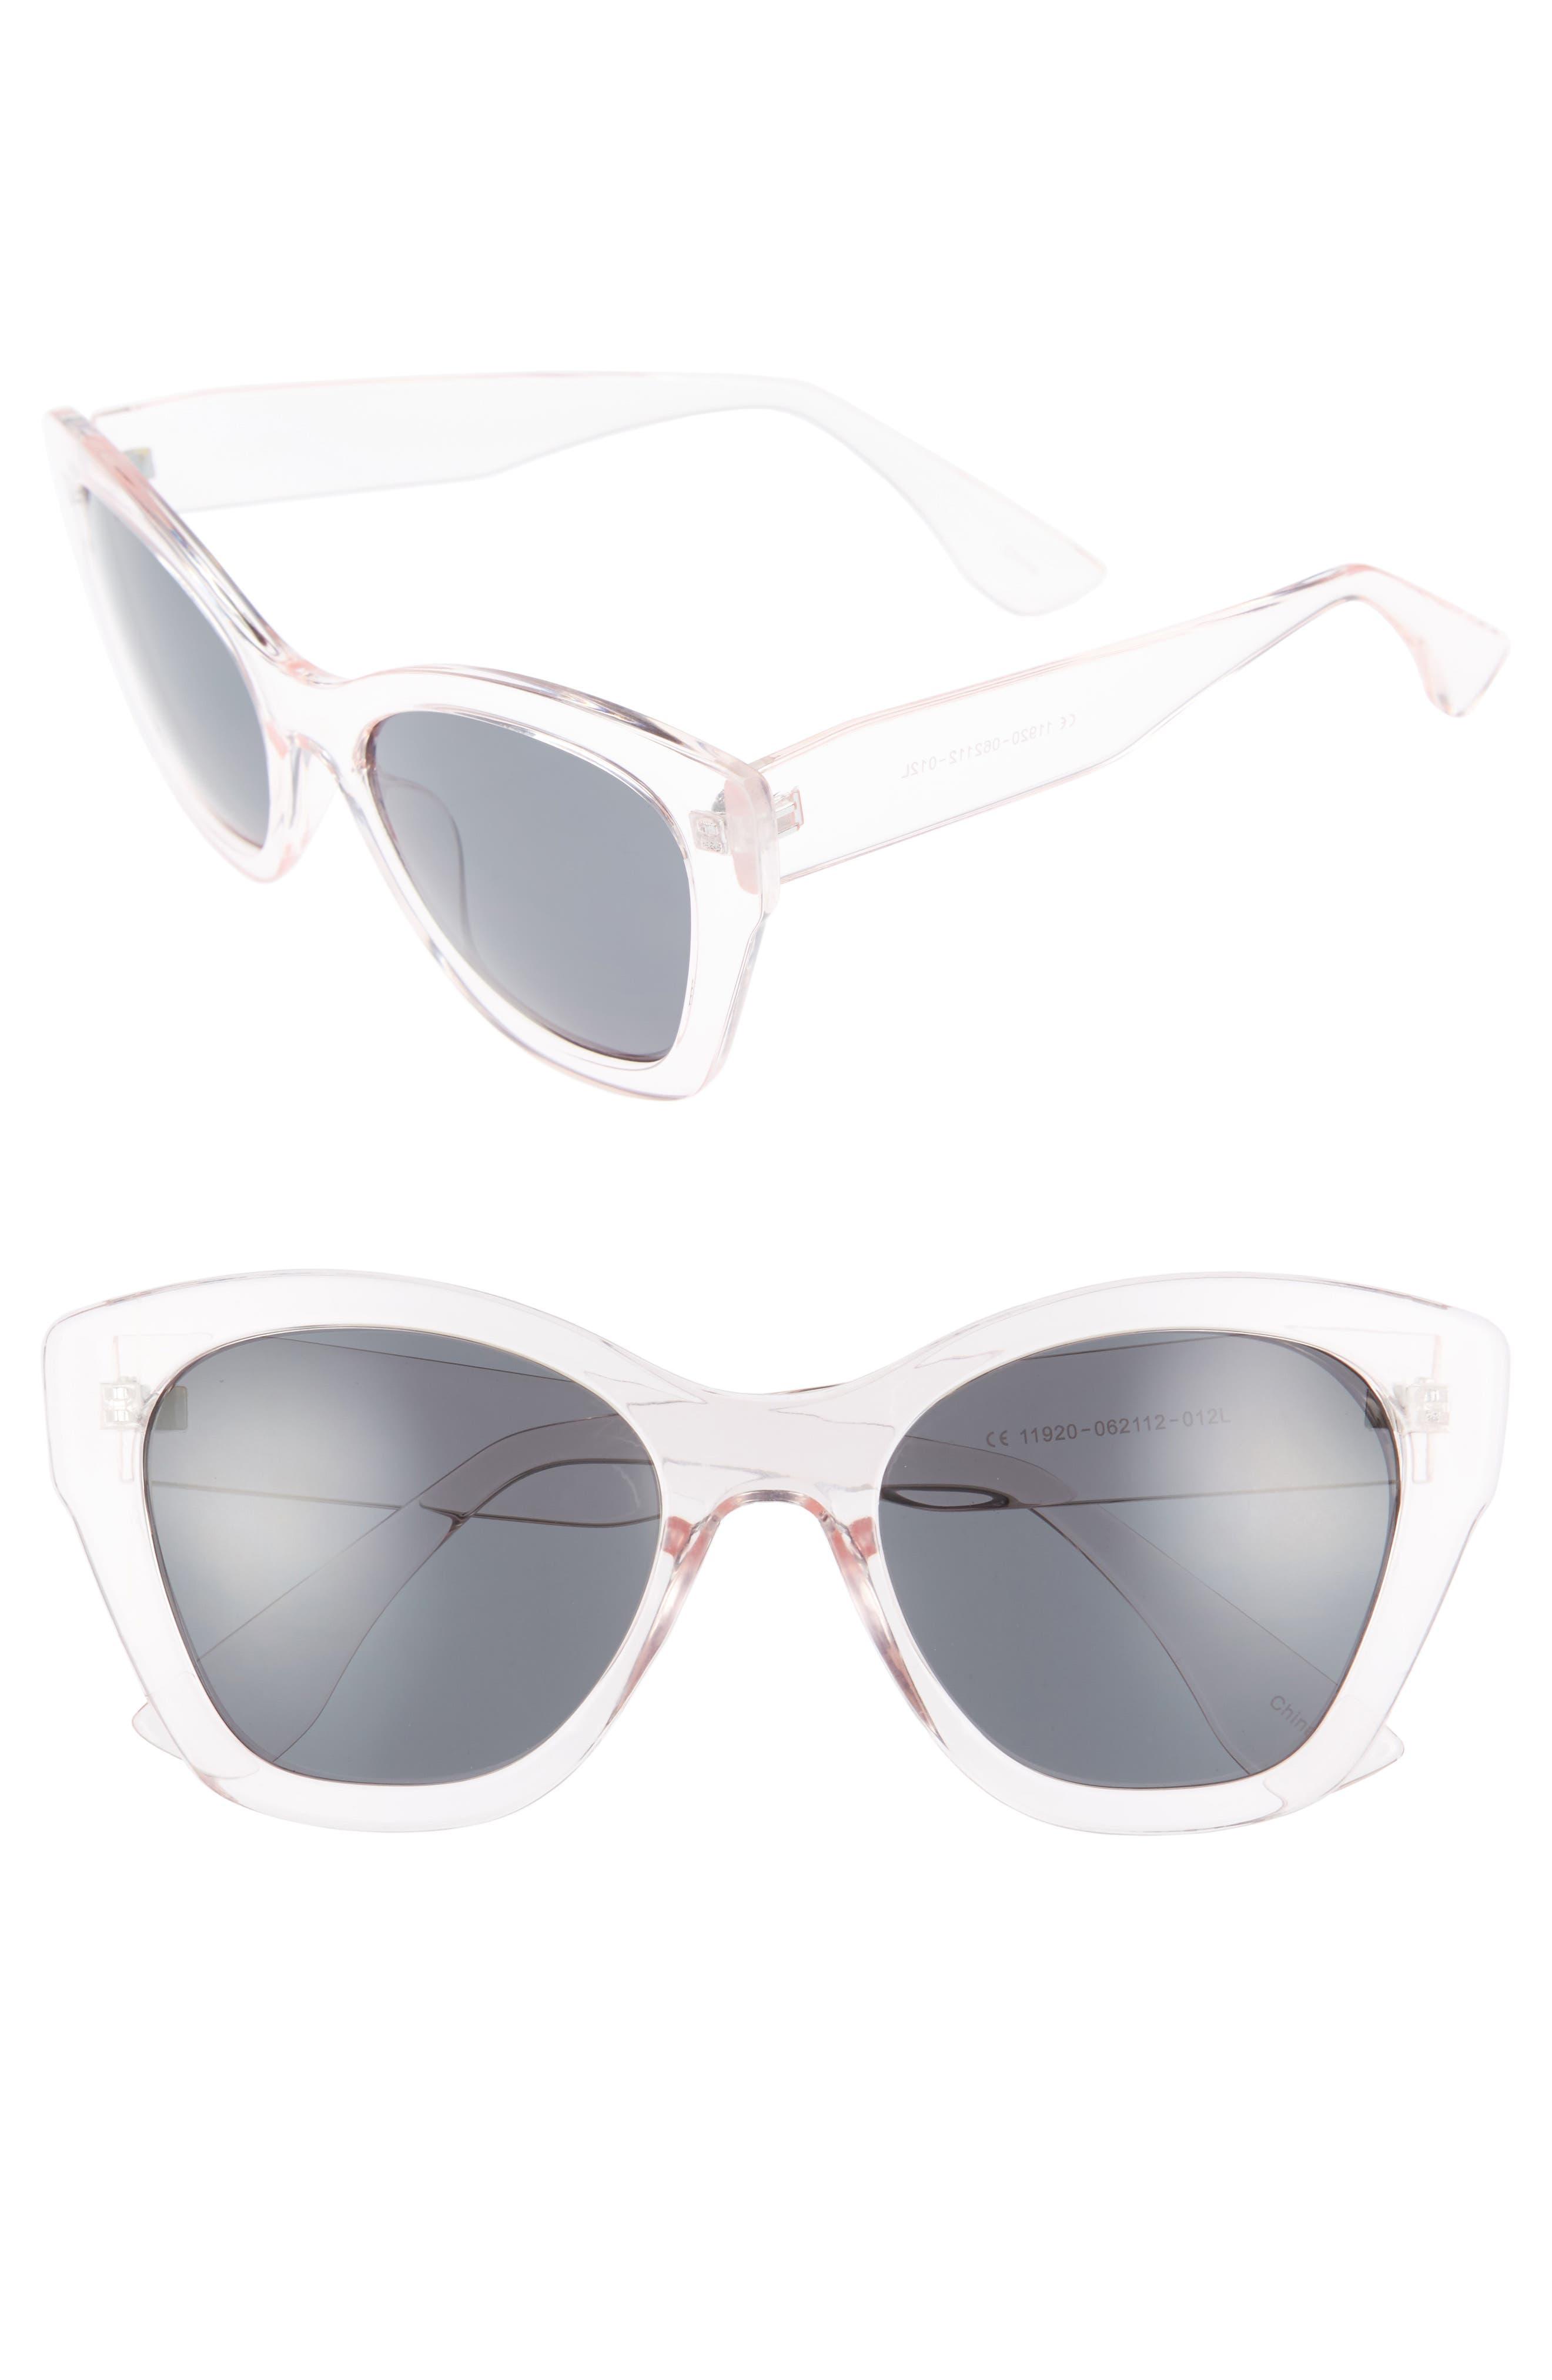 55mm Square Sunglasses,                         Main,                         color, Blush